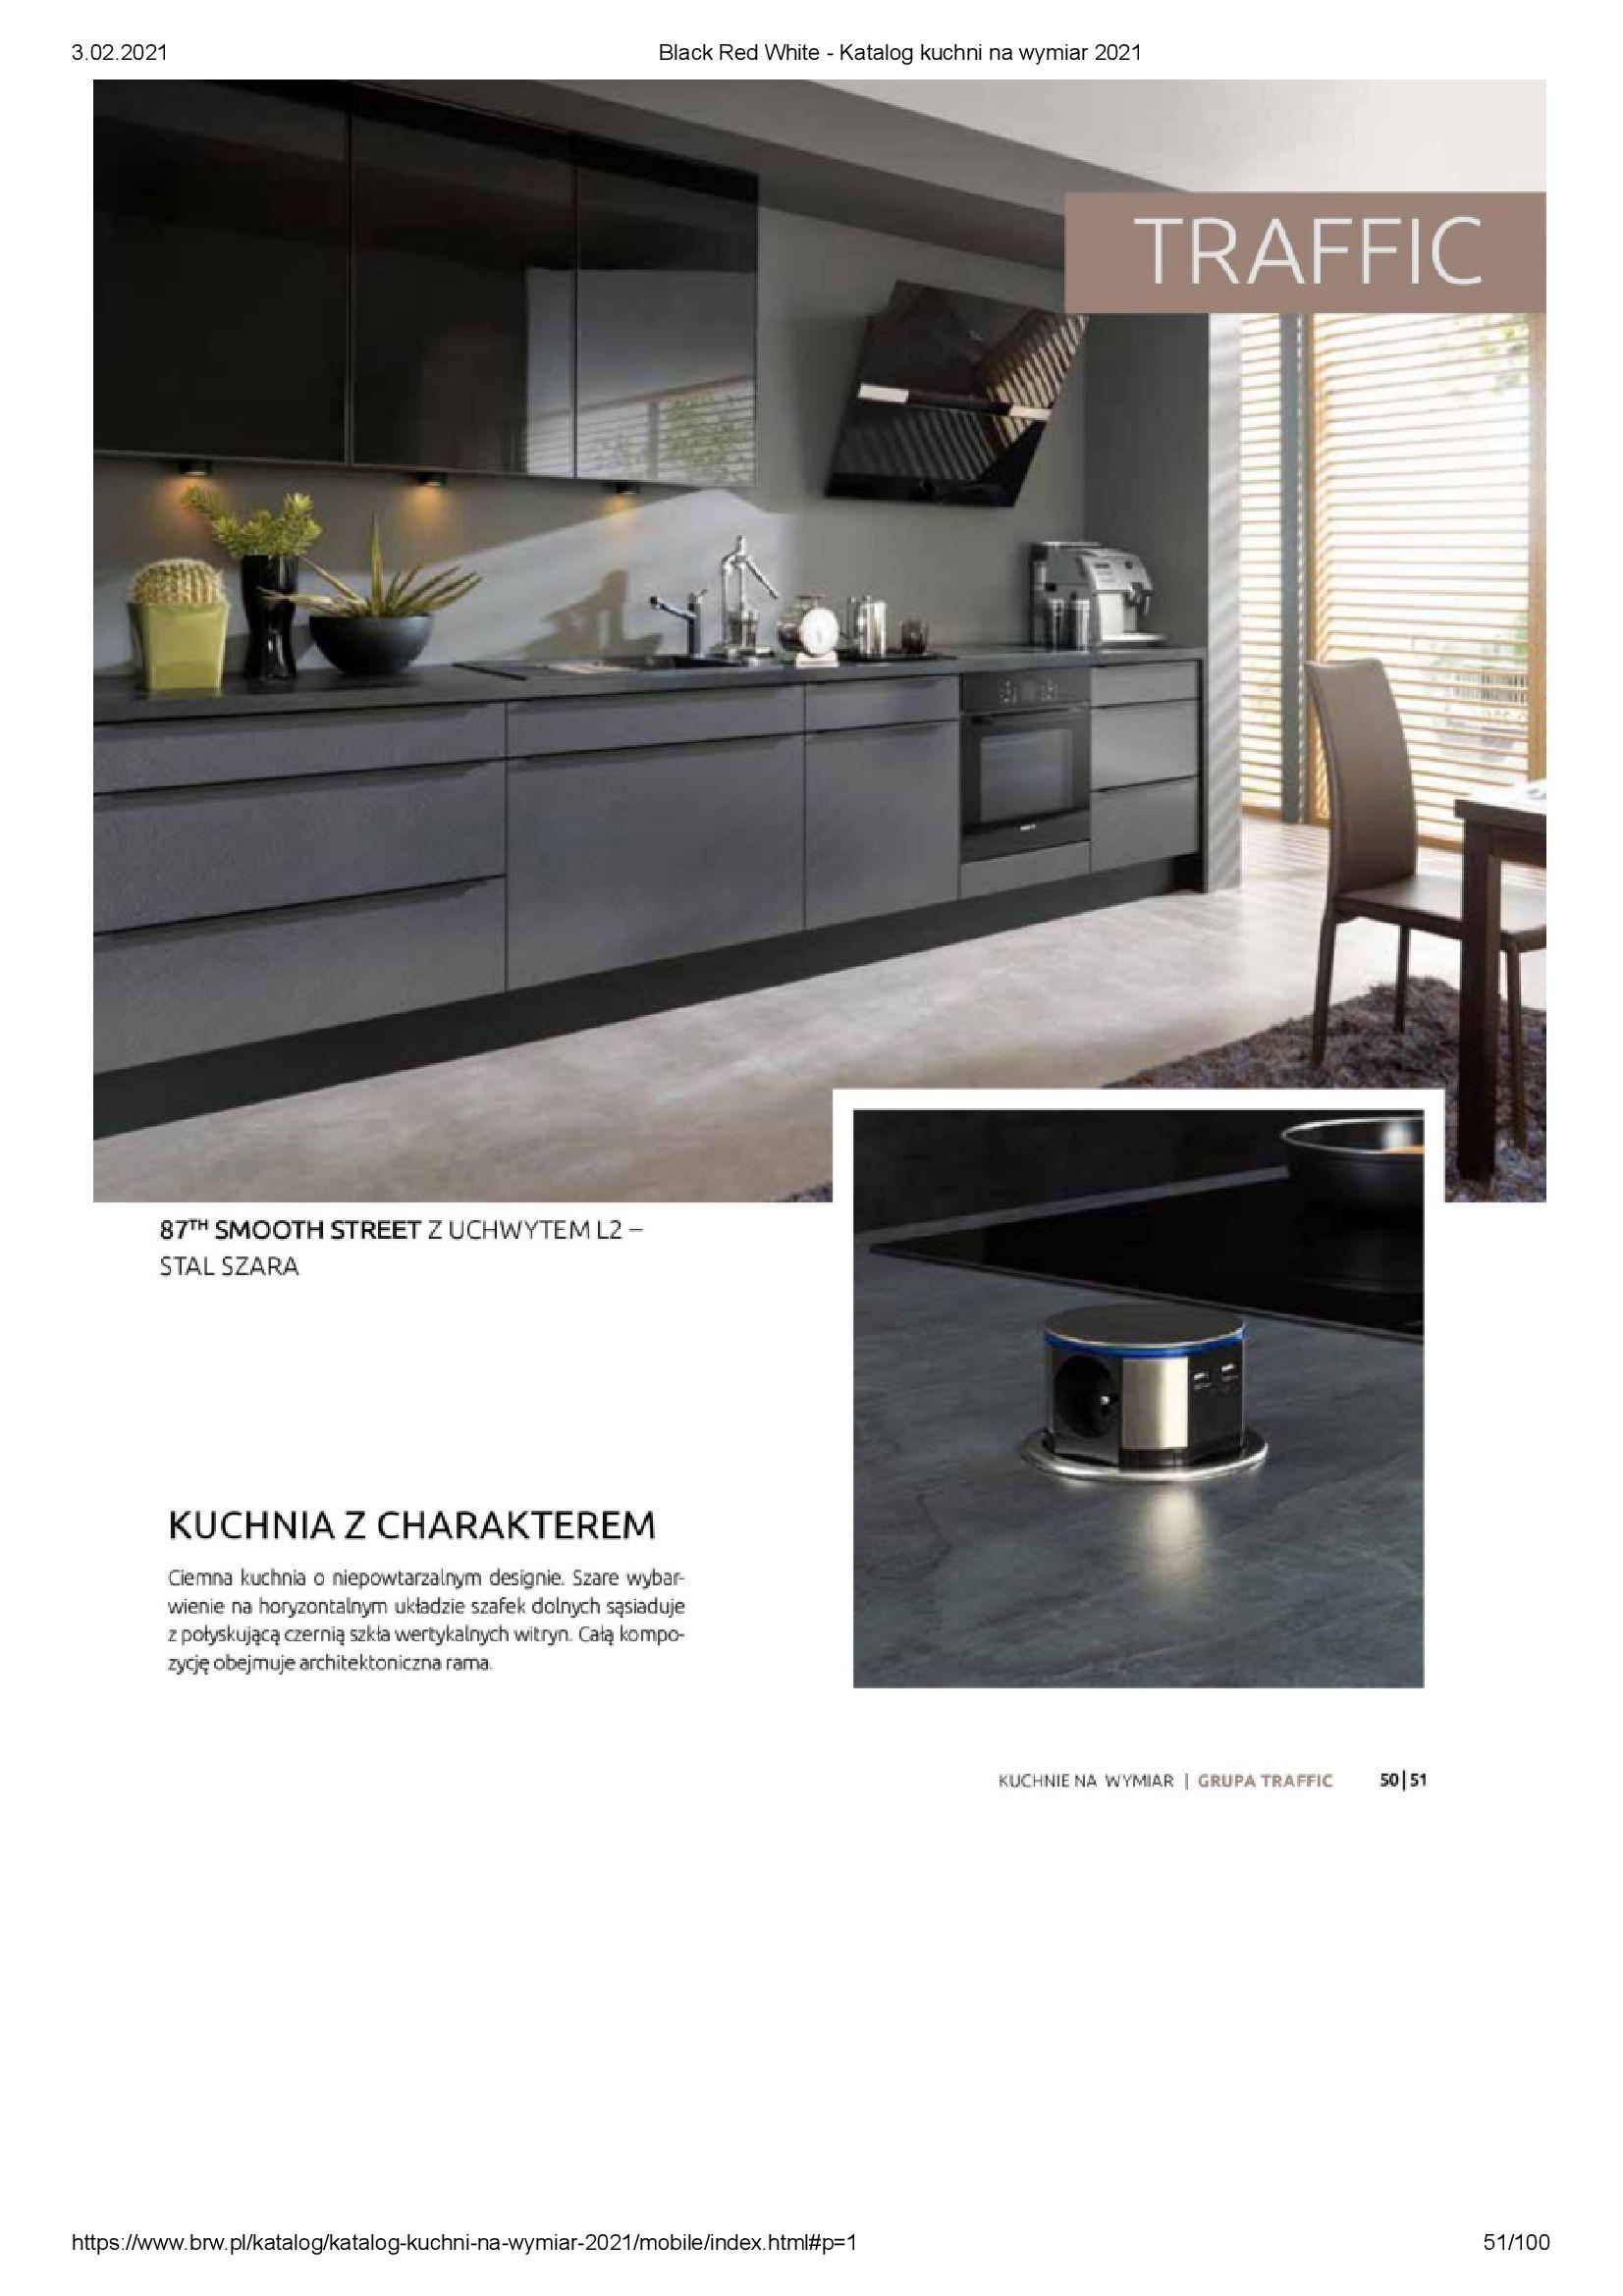 Gazetka Black Red White: Katalog - Kuchnie na wymiar Senso Kitchens 2021 2021-01-01 page-51